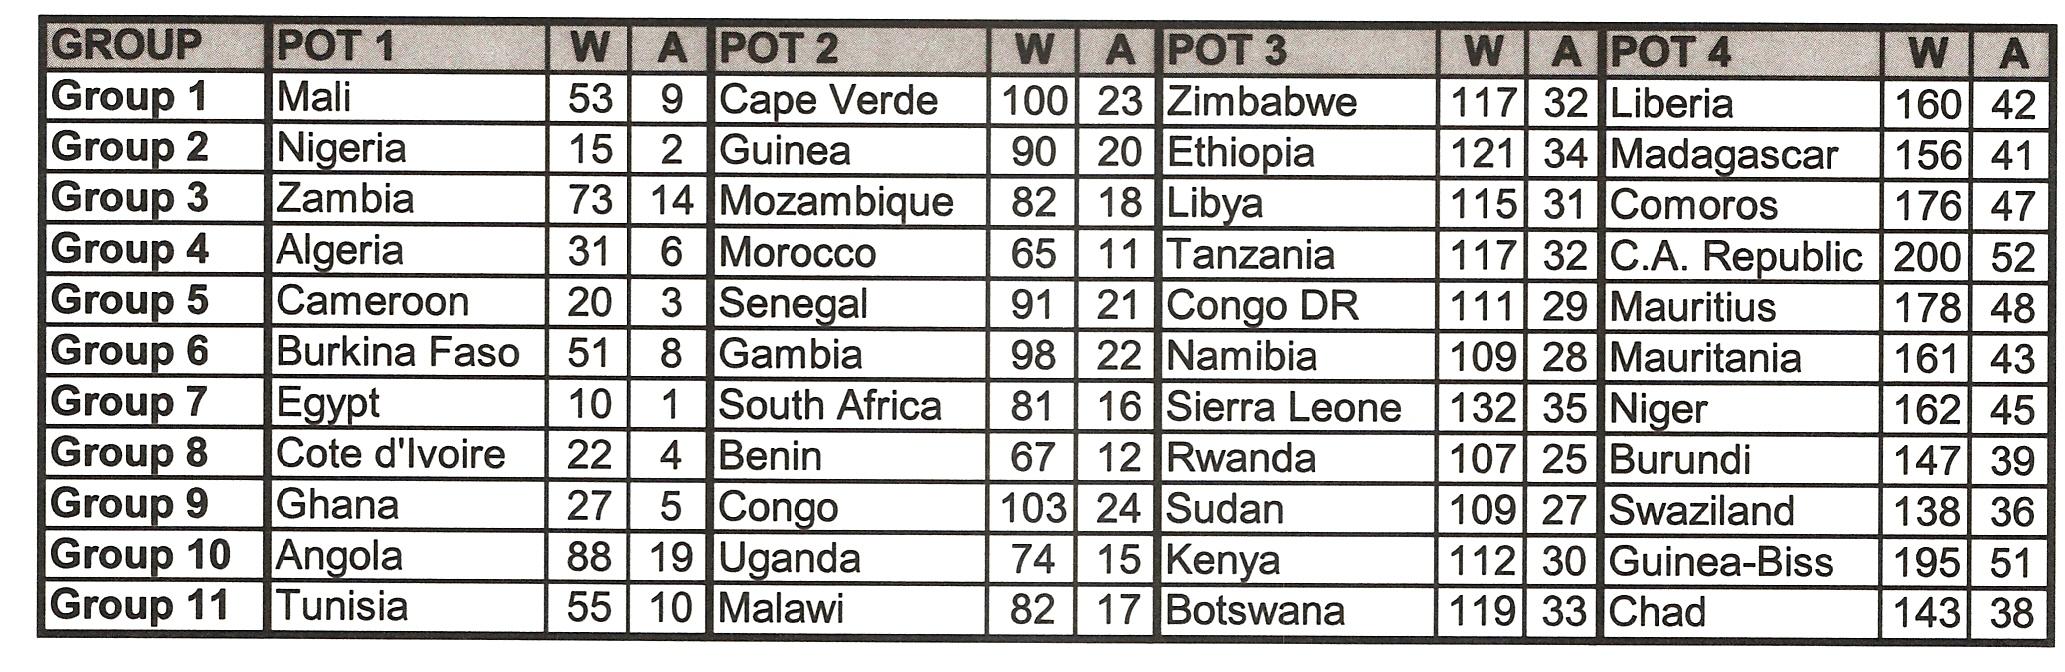 Seeding Criteria for Orange CAN 2012 draw - Malawi